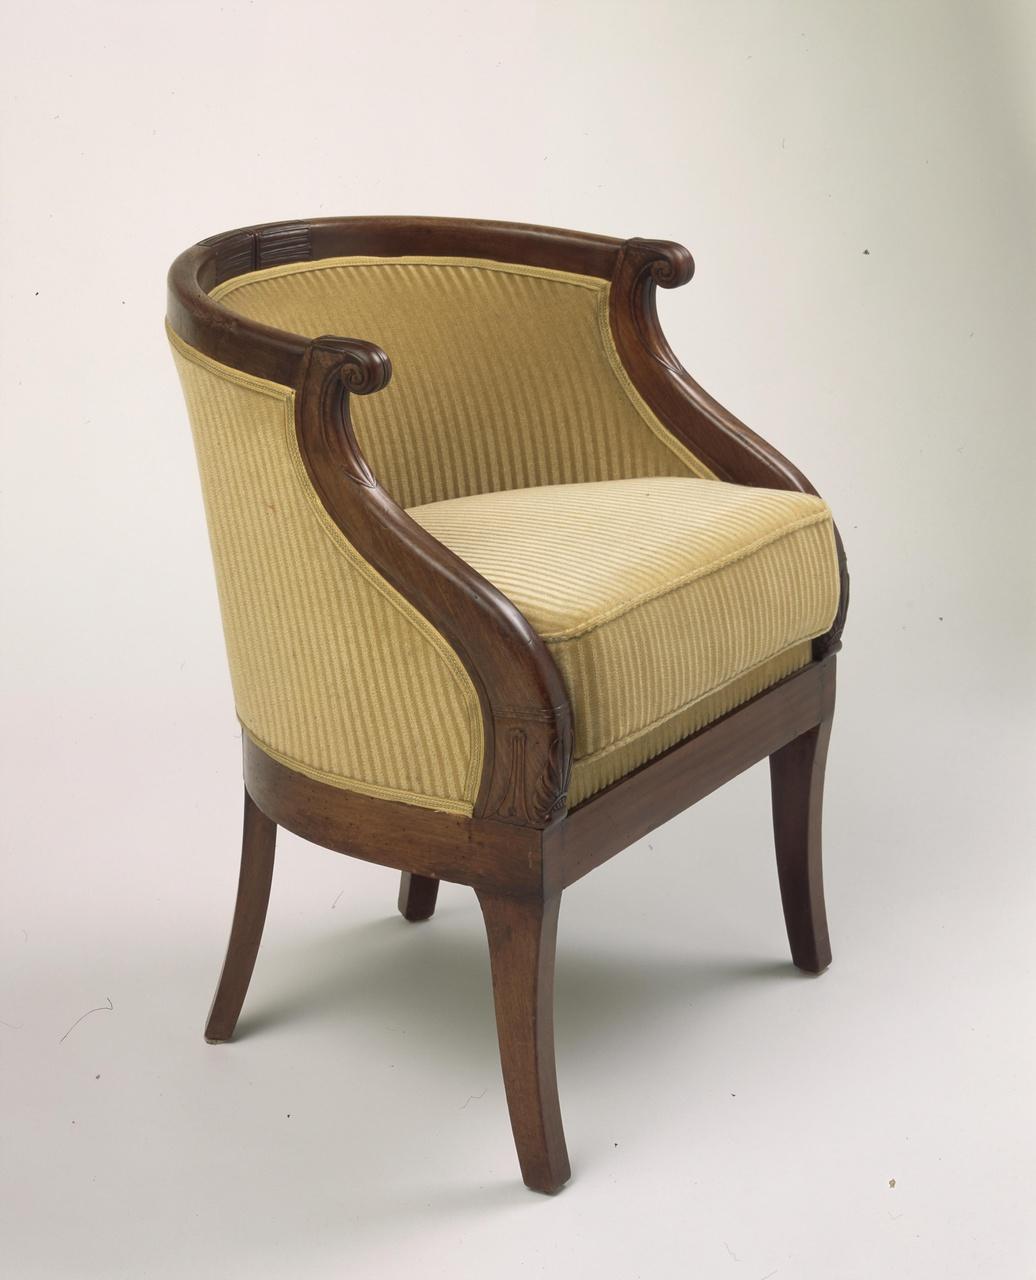 Bureaustoel (fauteuil en gondole)